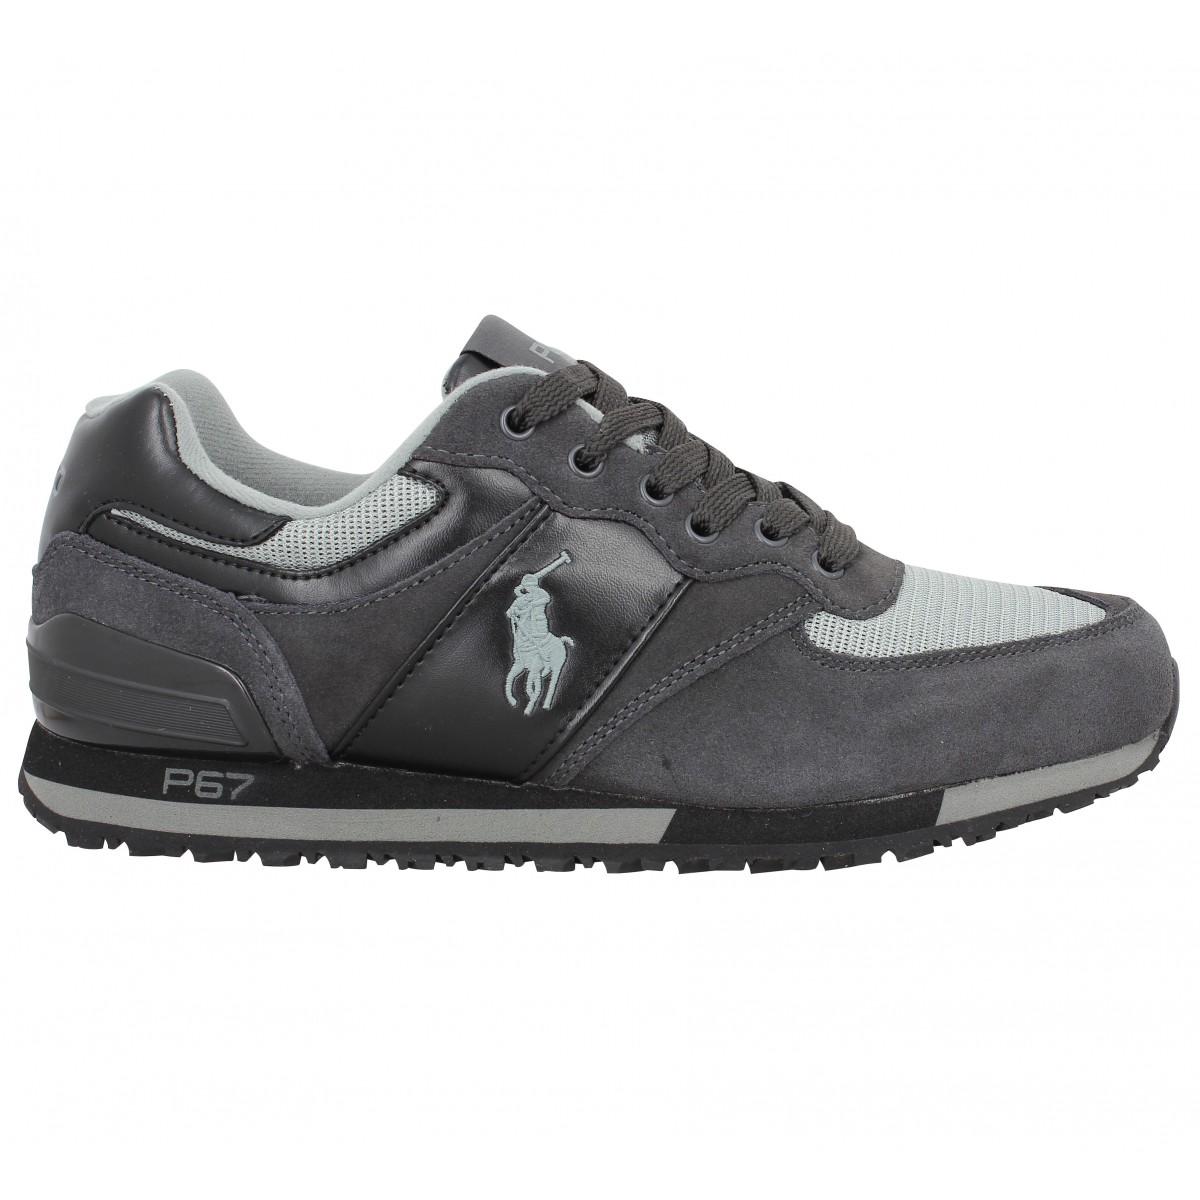 Chaussures De Sport Lage Poney Slaton Polo Ralph Lauren uqXg8